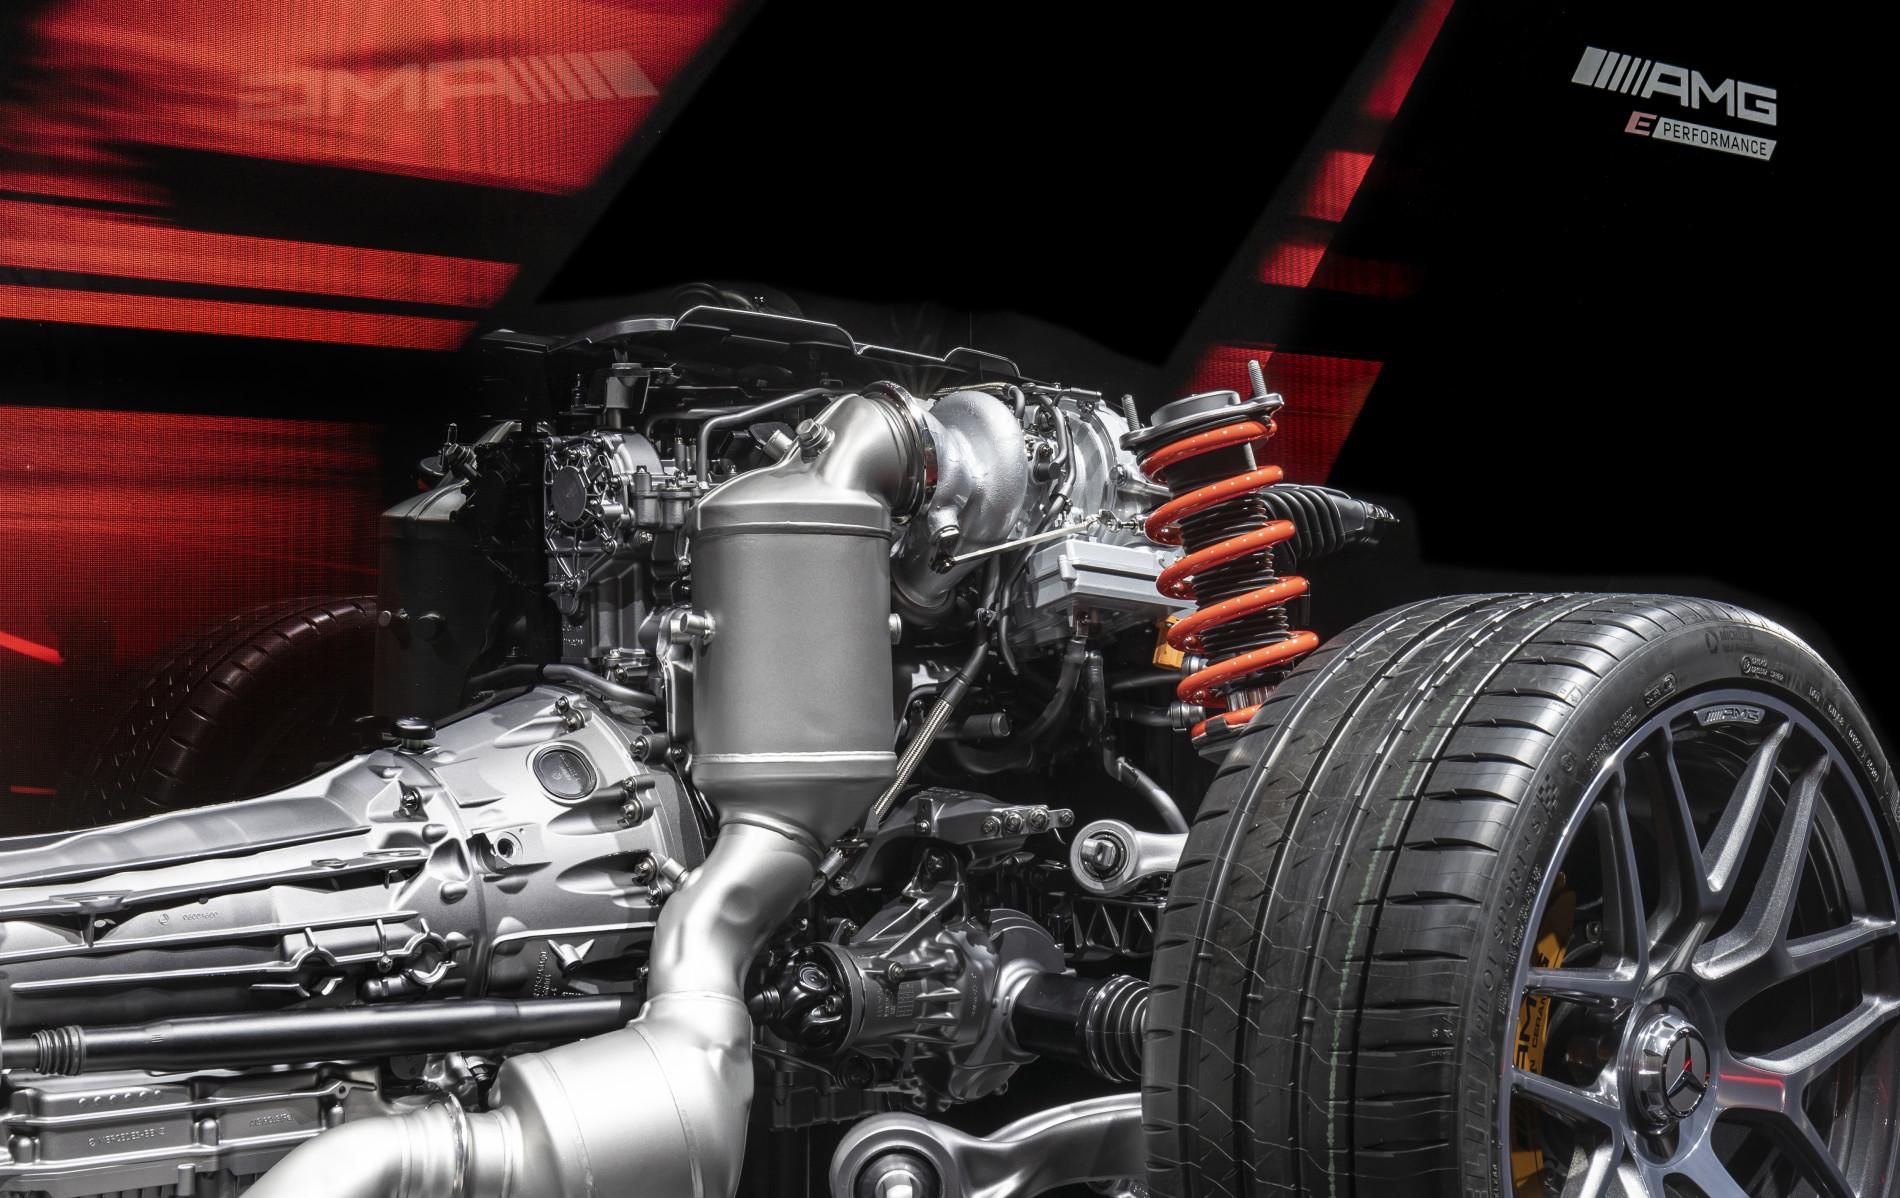 Mercedes-AMG C63 - Poze noi - Mercedes-AMG C63 - Poze noi